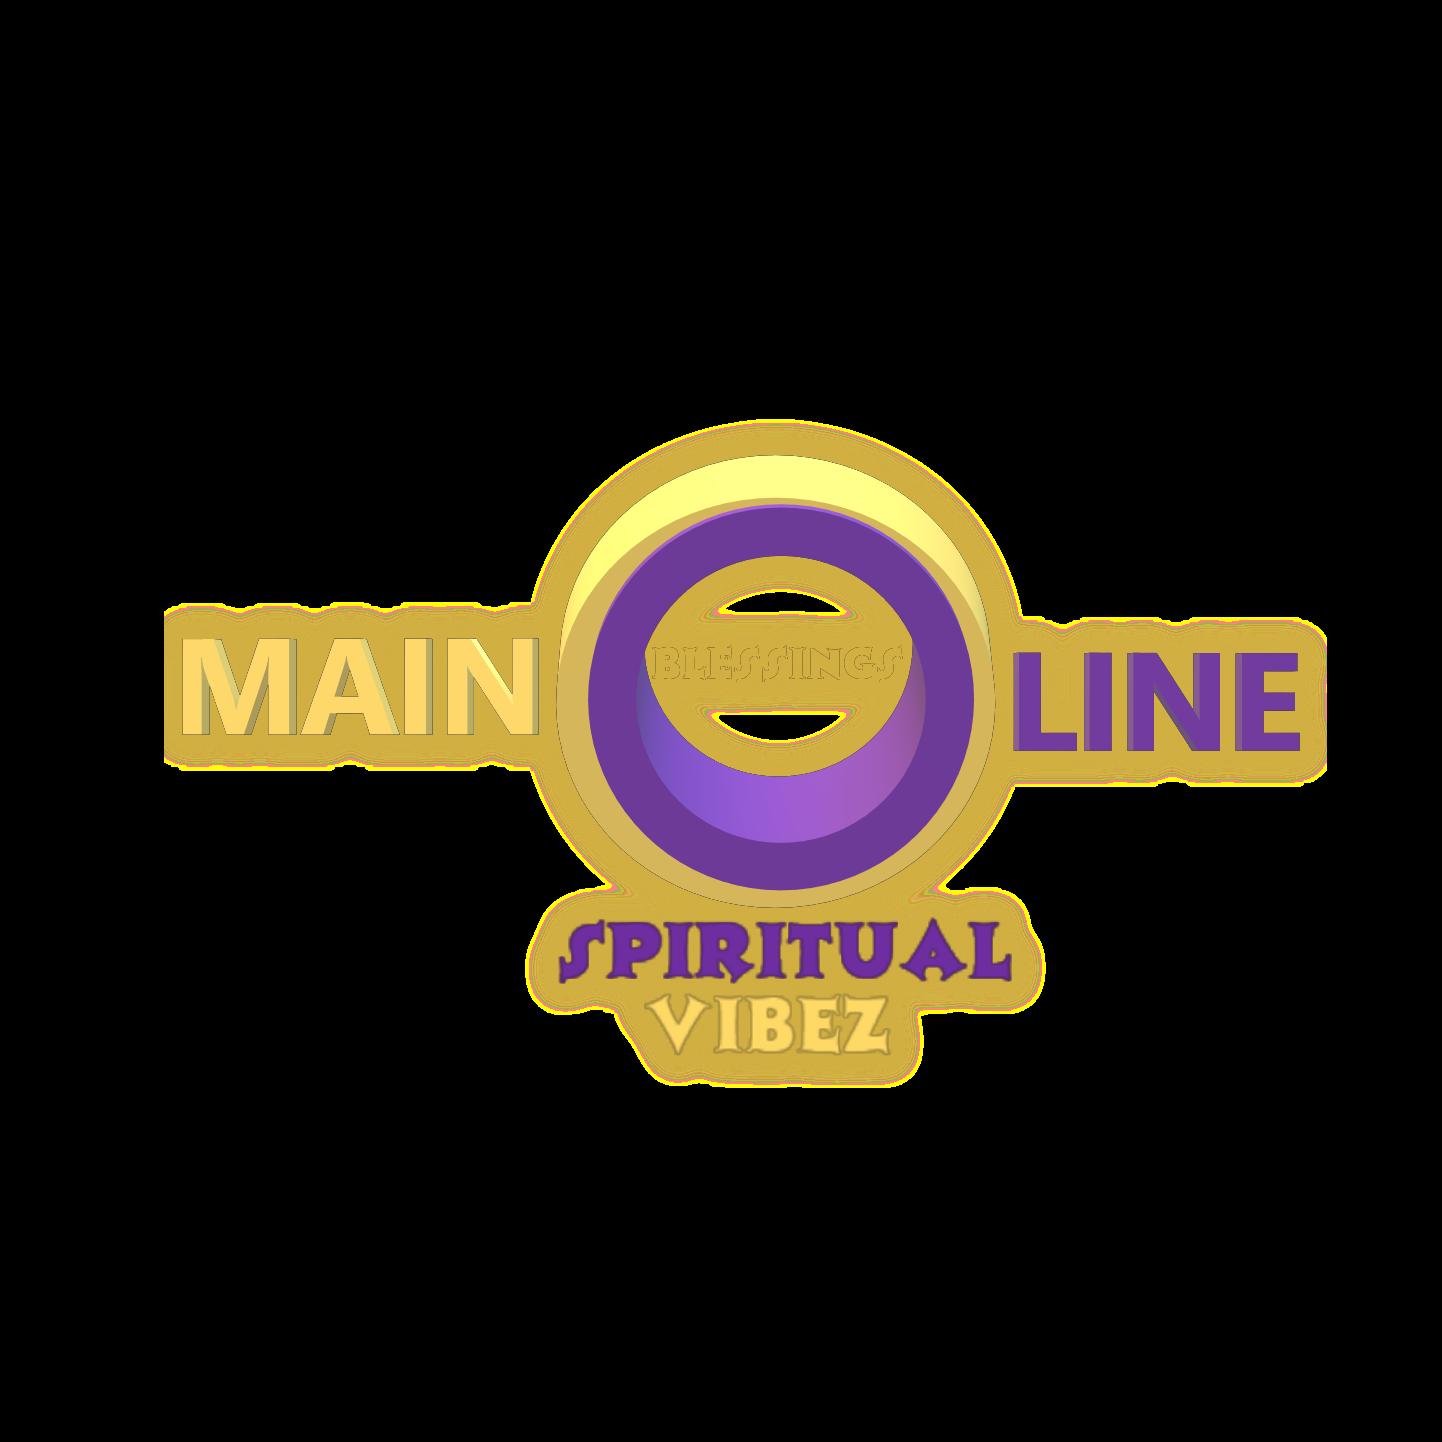 MainLine Spiritual Vibez Radio Blessin! host by SeanB